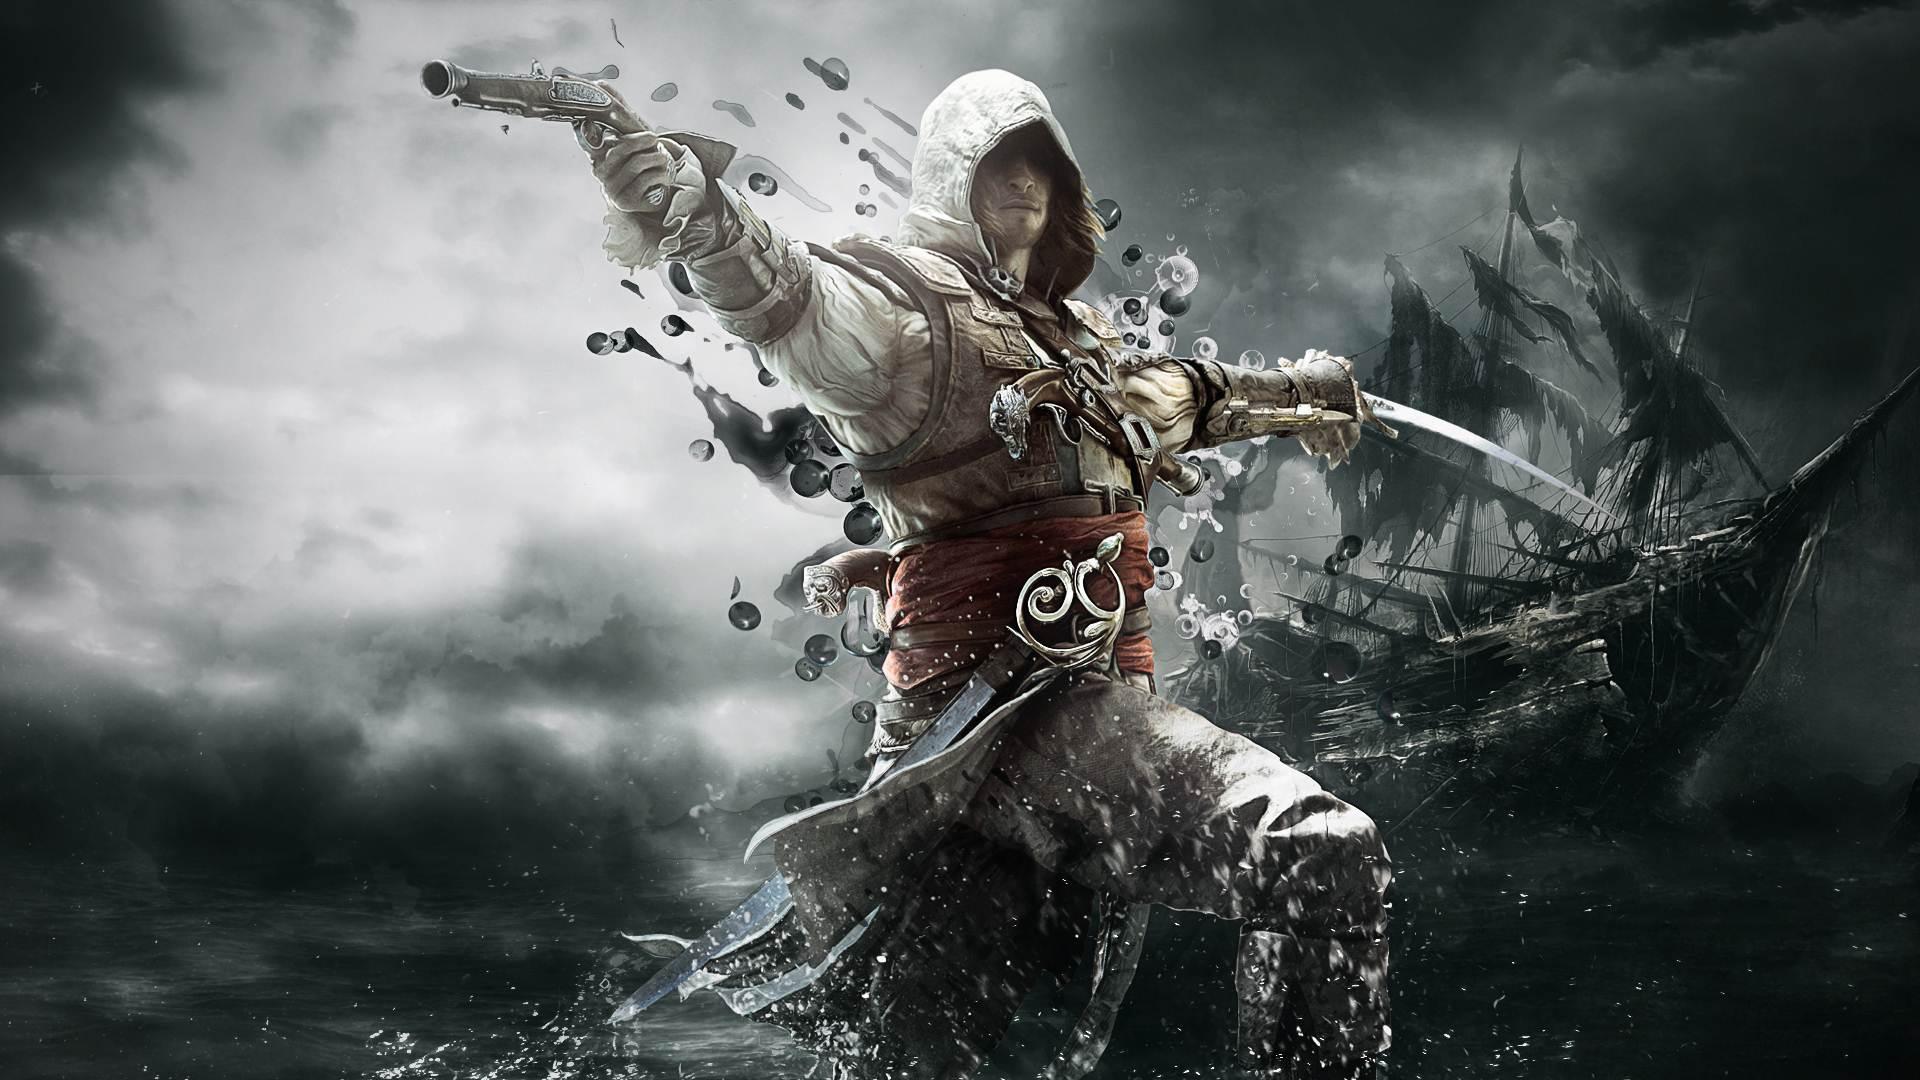 Assassins Creed IV Black Flag wallpaper 7